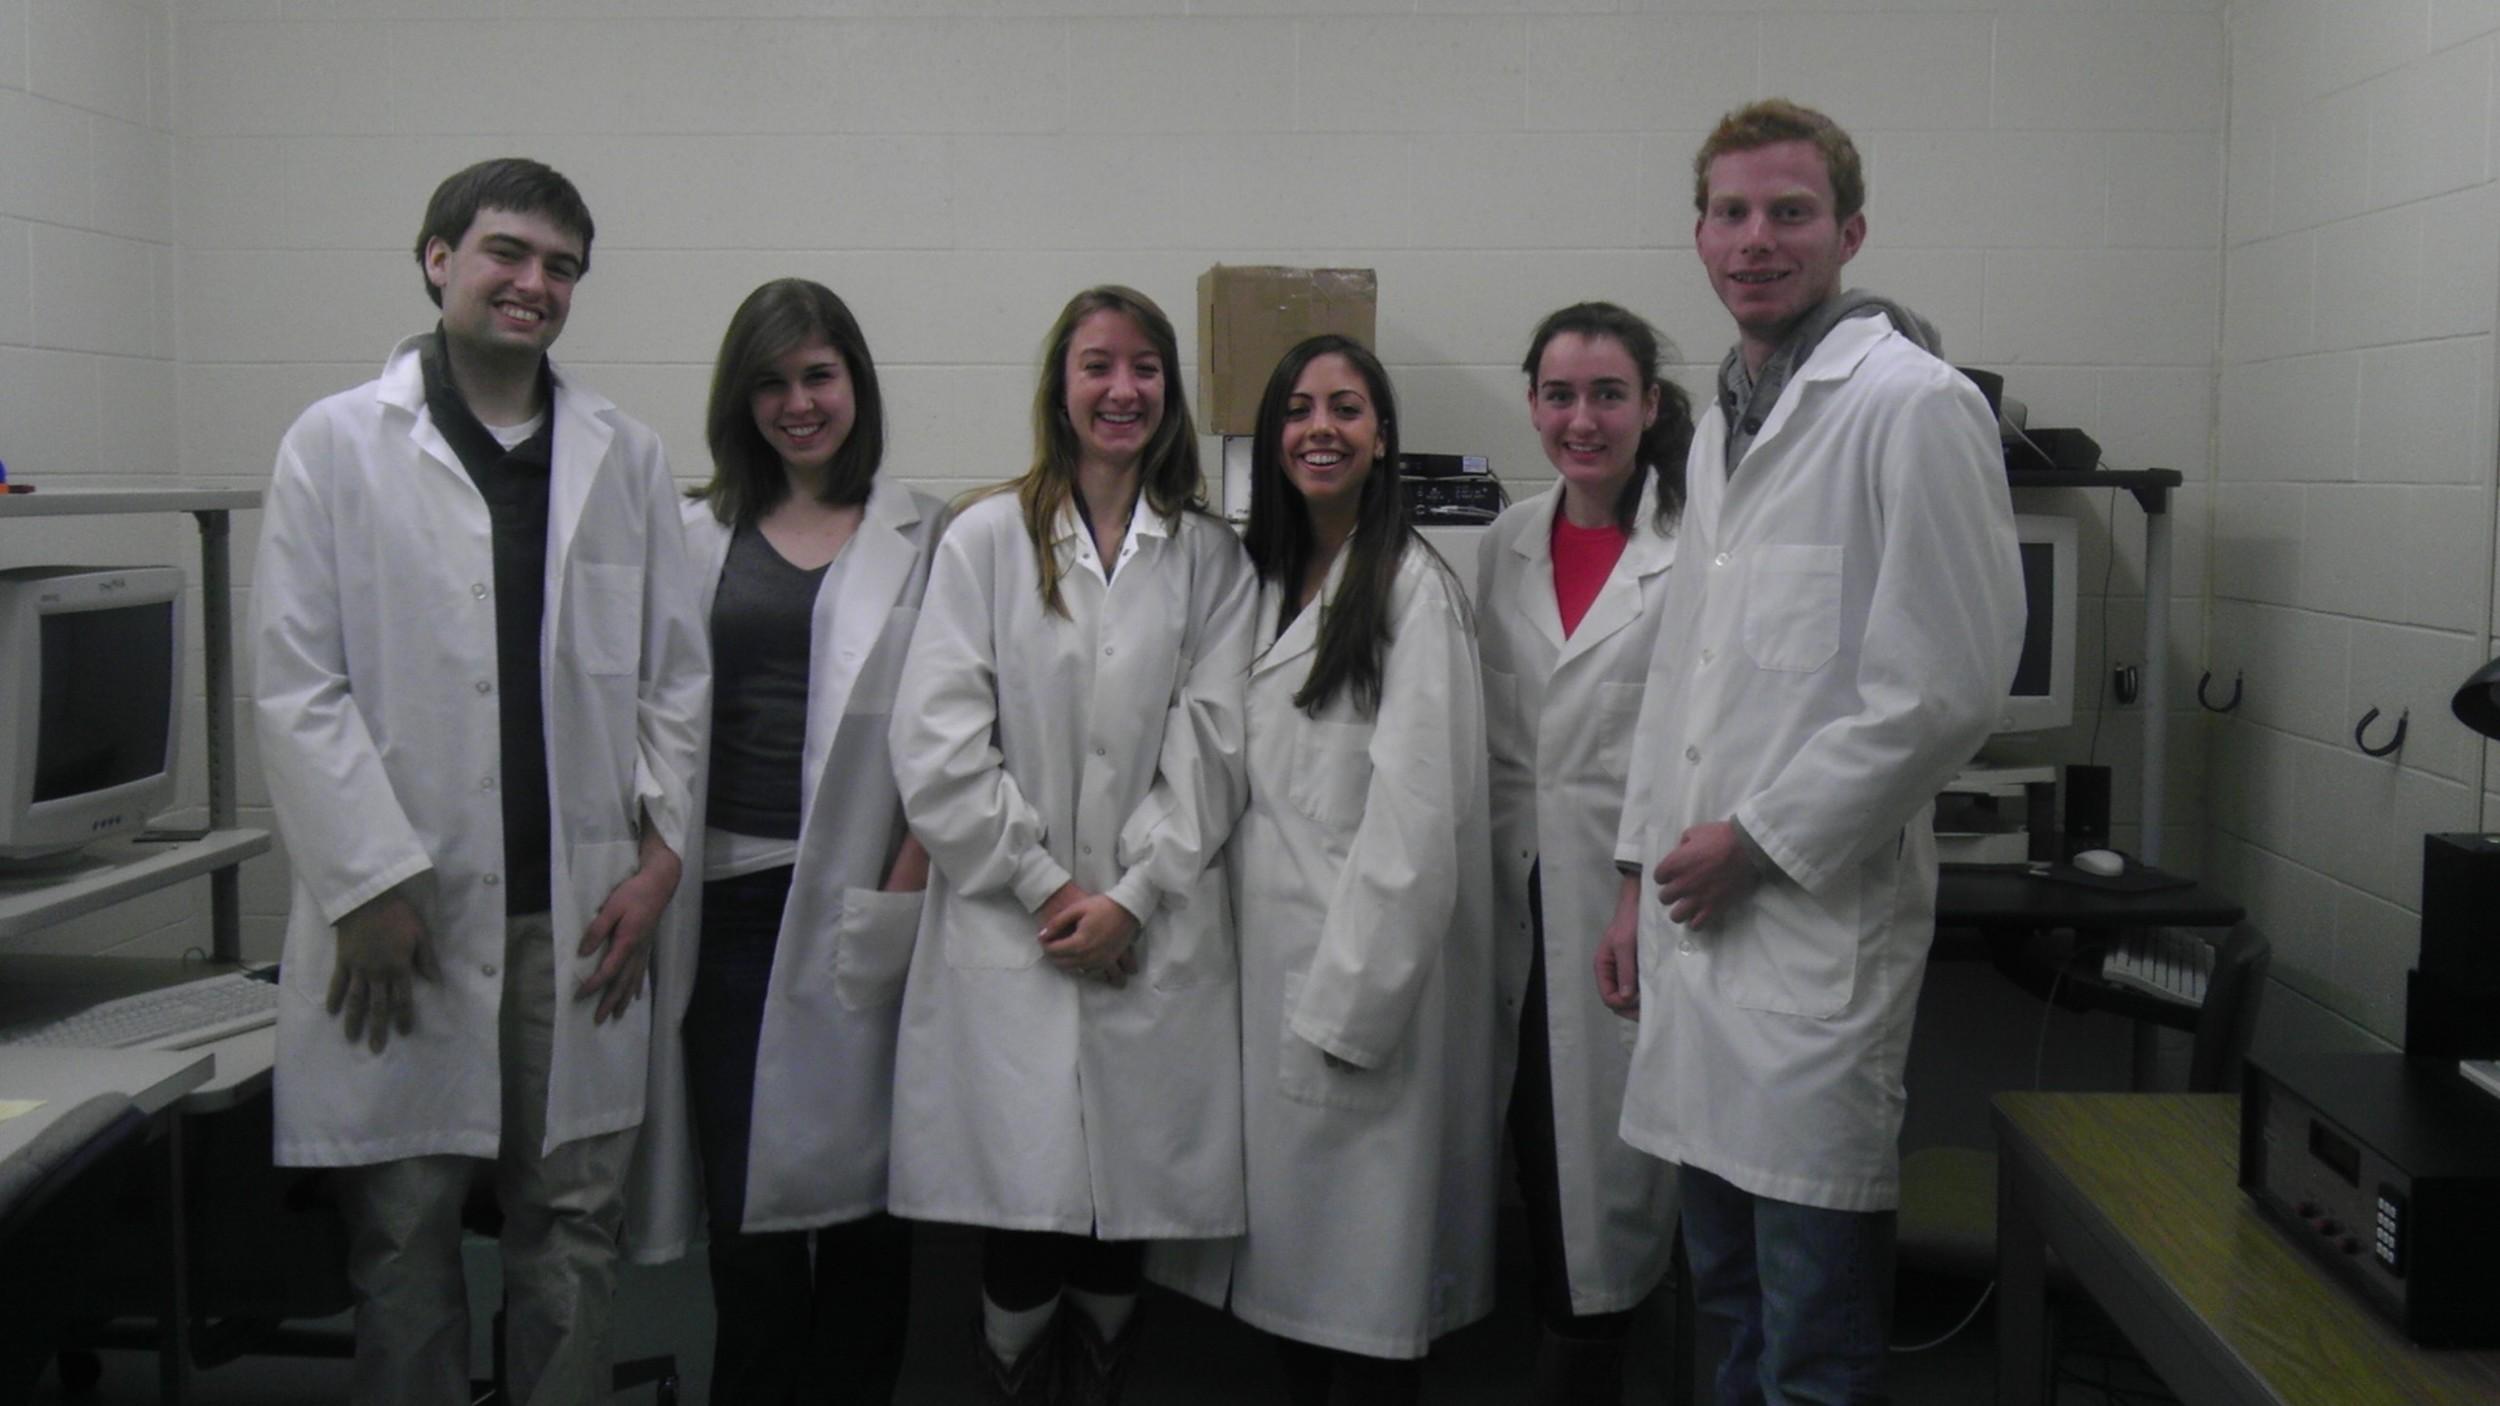 Ryan, Katerina, Brittany, Danielle, Caroline & Ryan. NSSI team 2013